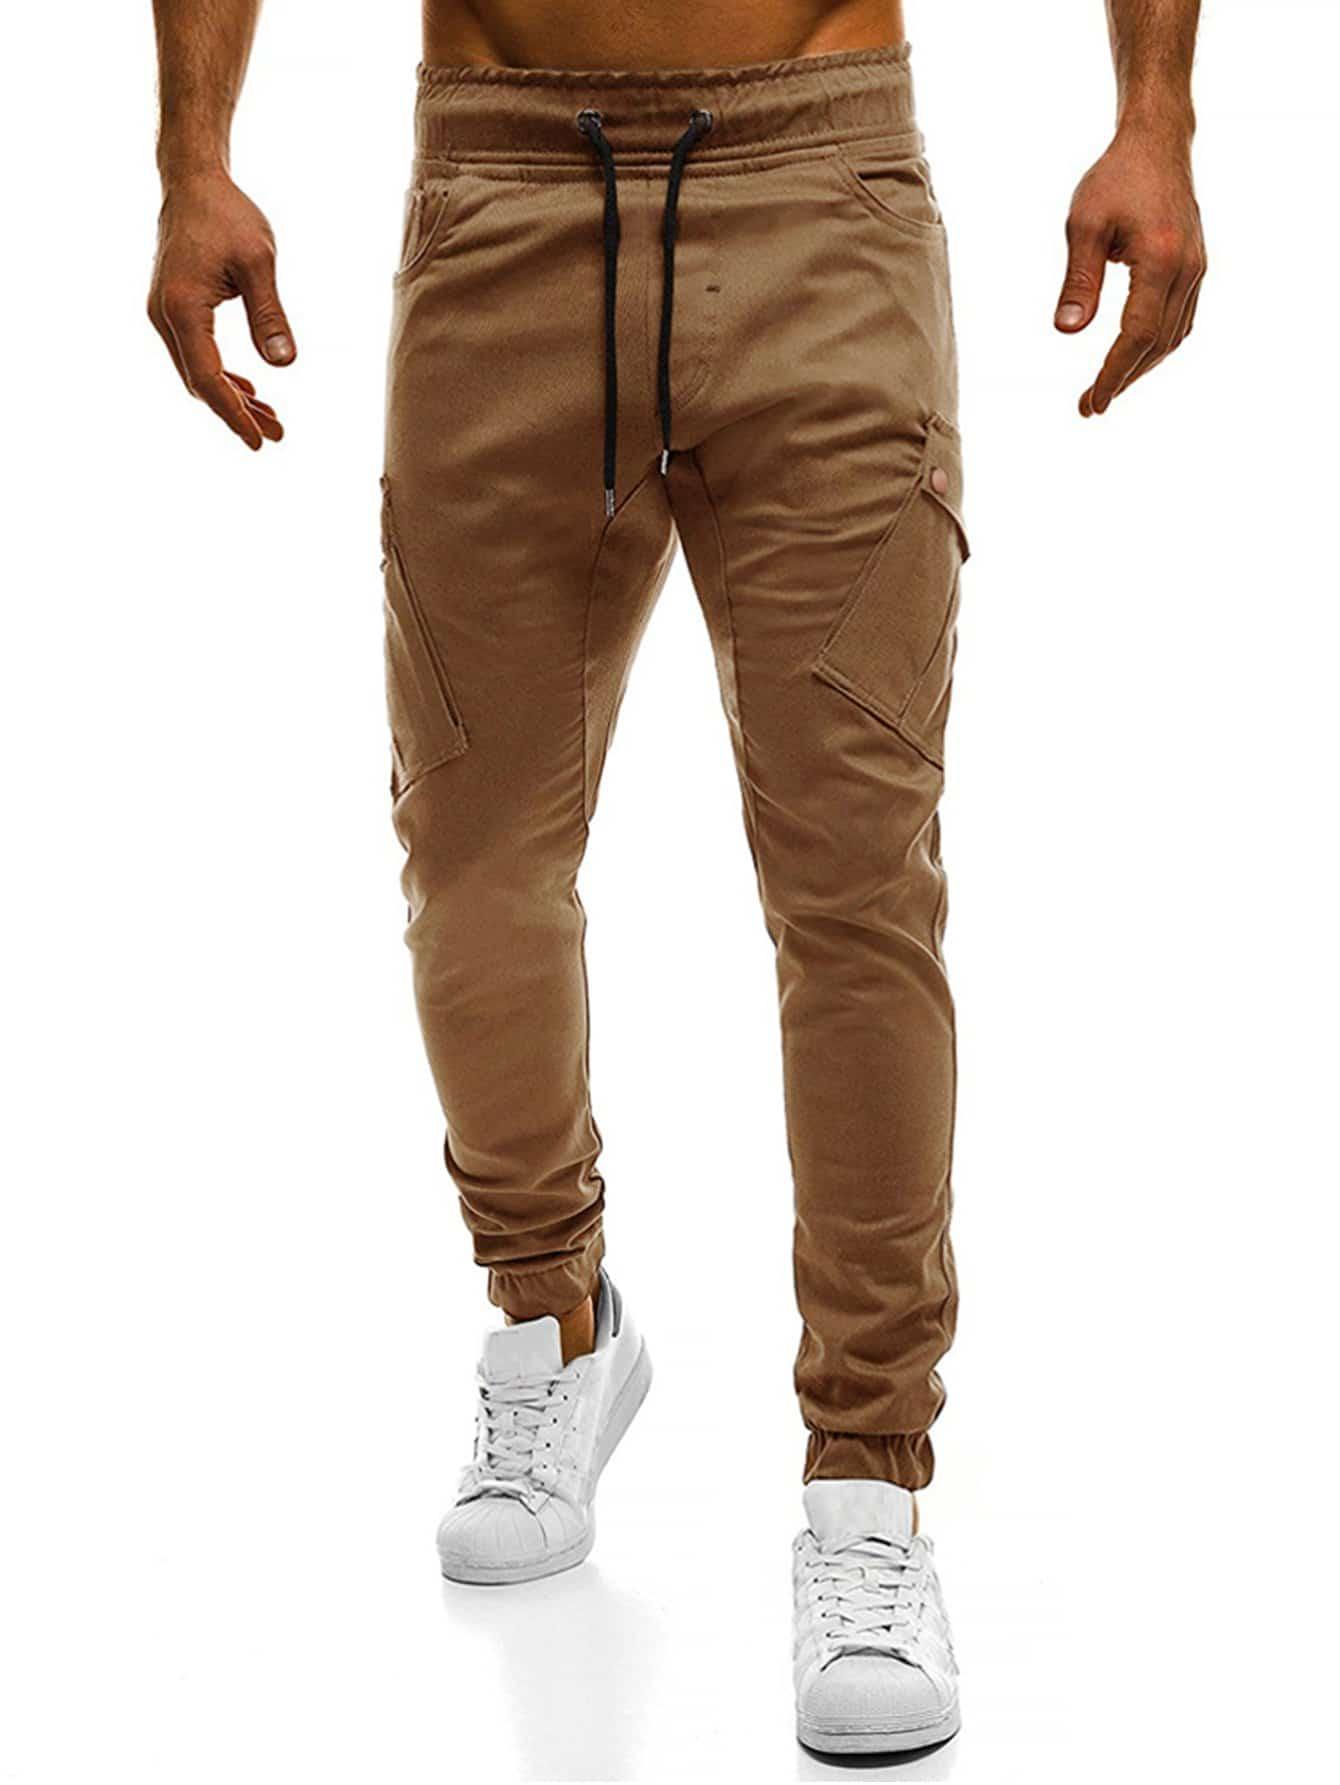 Men Pockets Decoration Plain Drawstring Pants